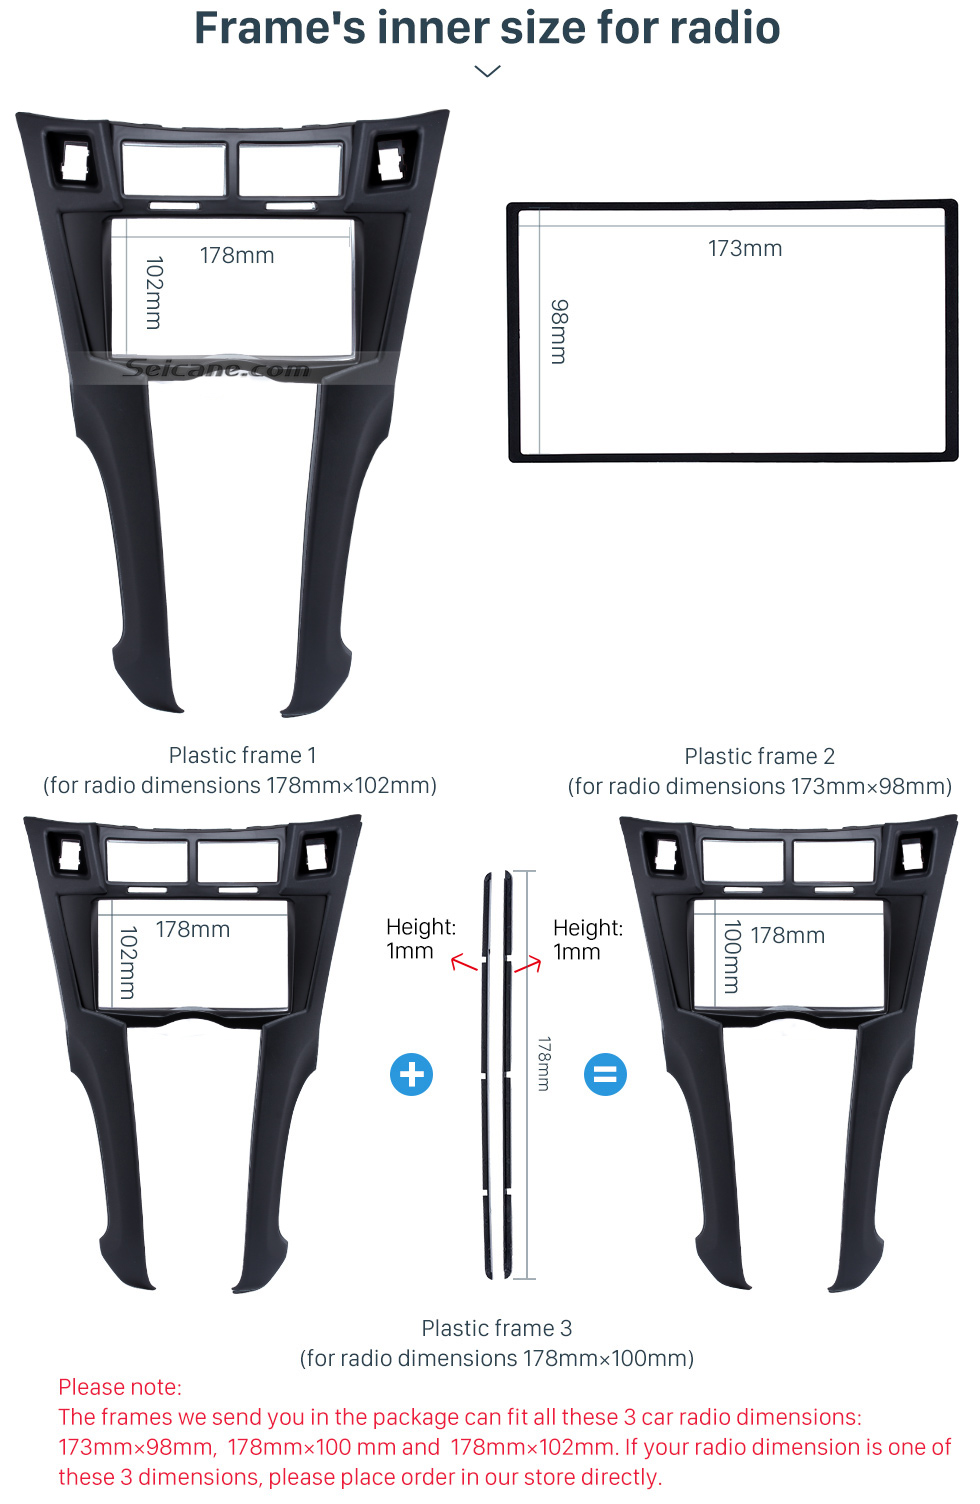 Frame's inner size for radio Black 2Din 2005-2011 Toyota Yaris Vitz Platz Car Radio Fascia Stereo Dash Trim Installation Fitting Frame